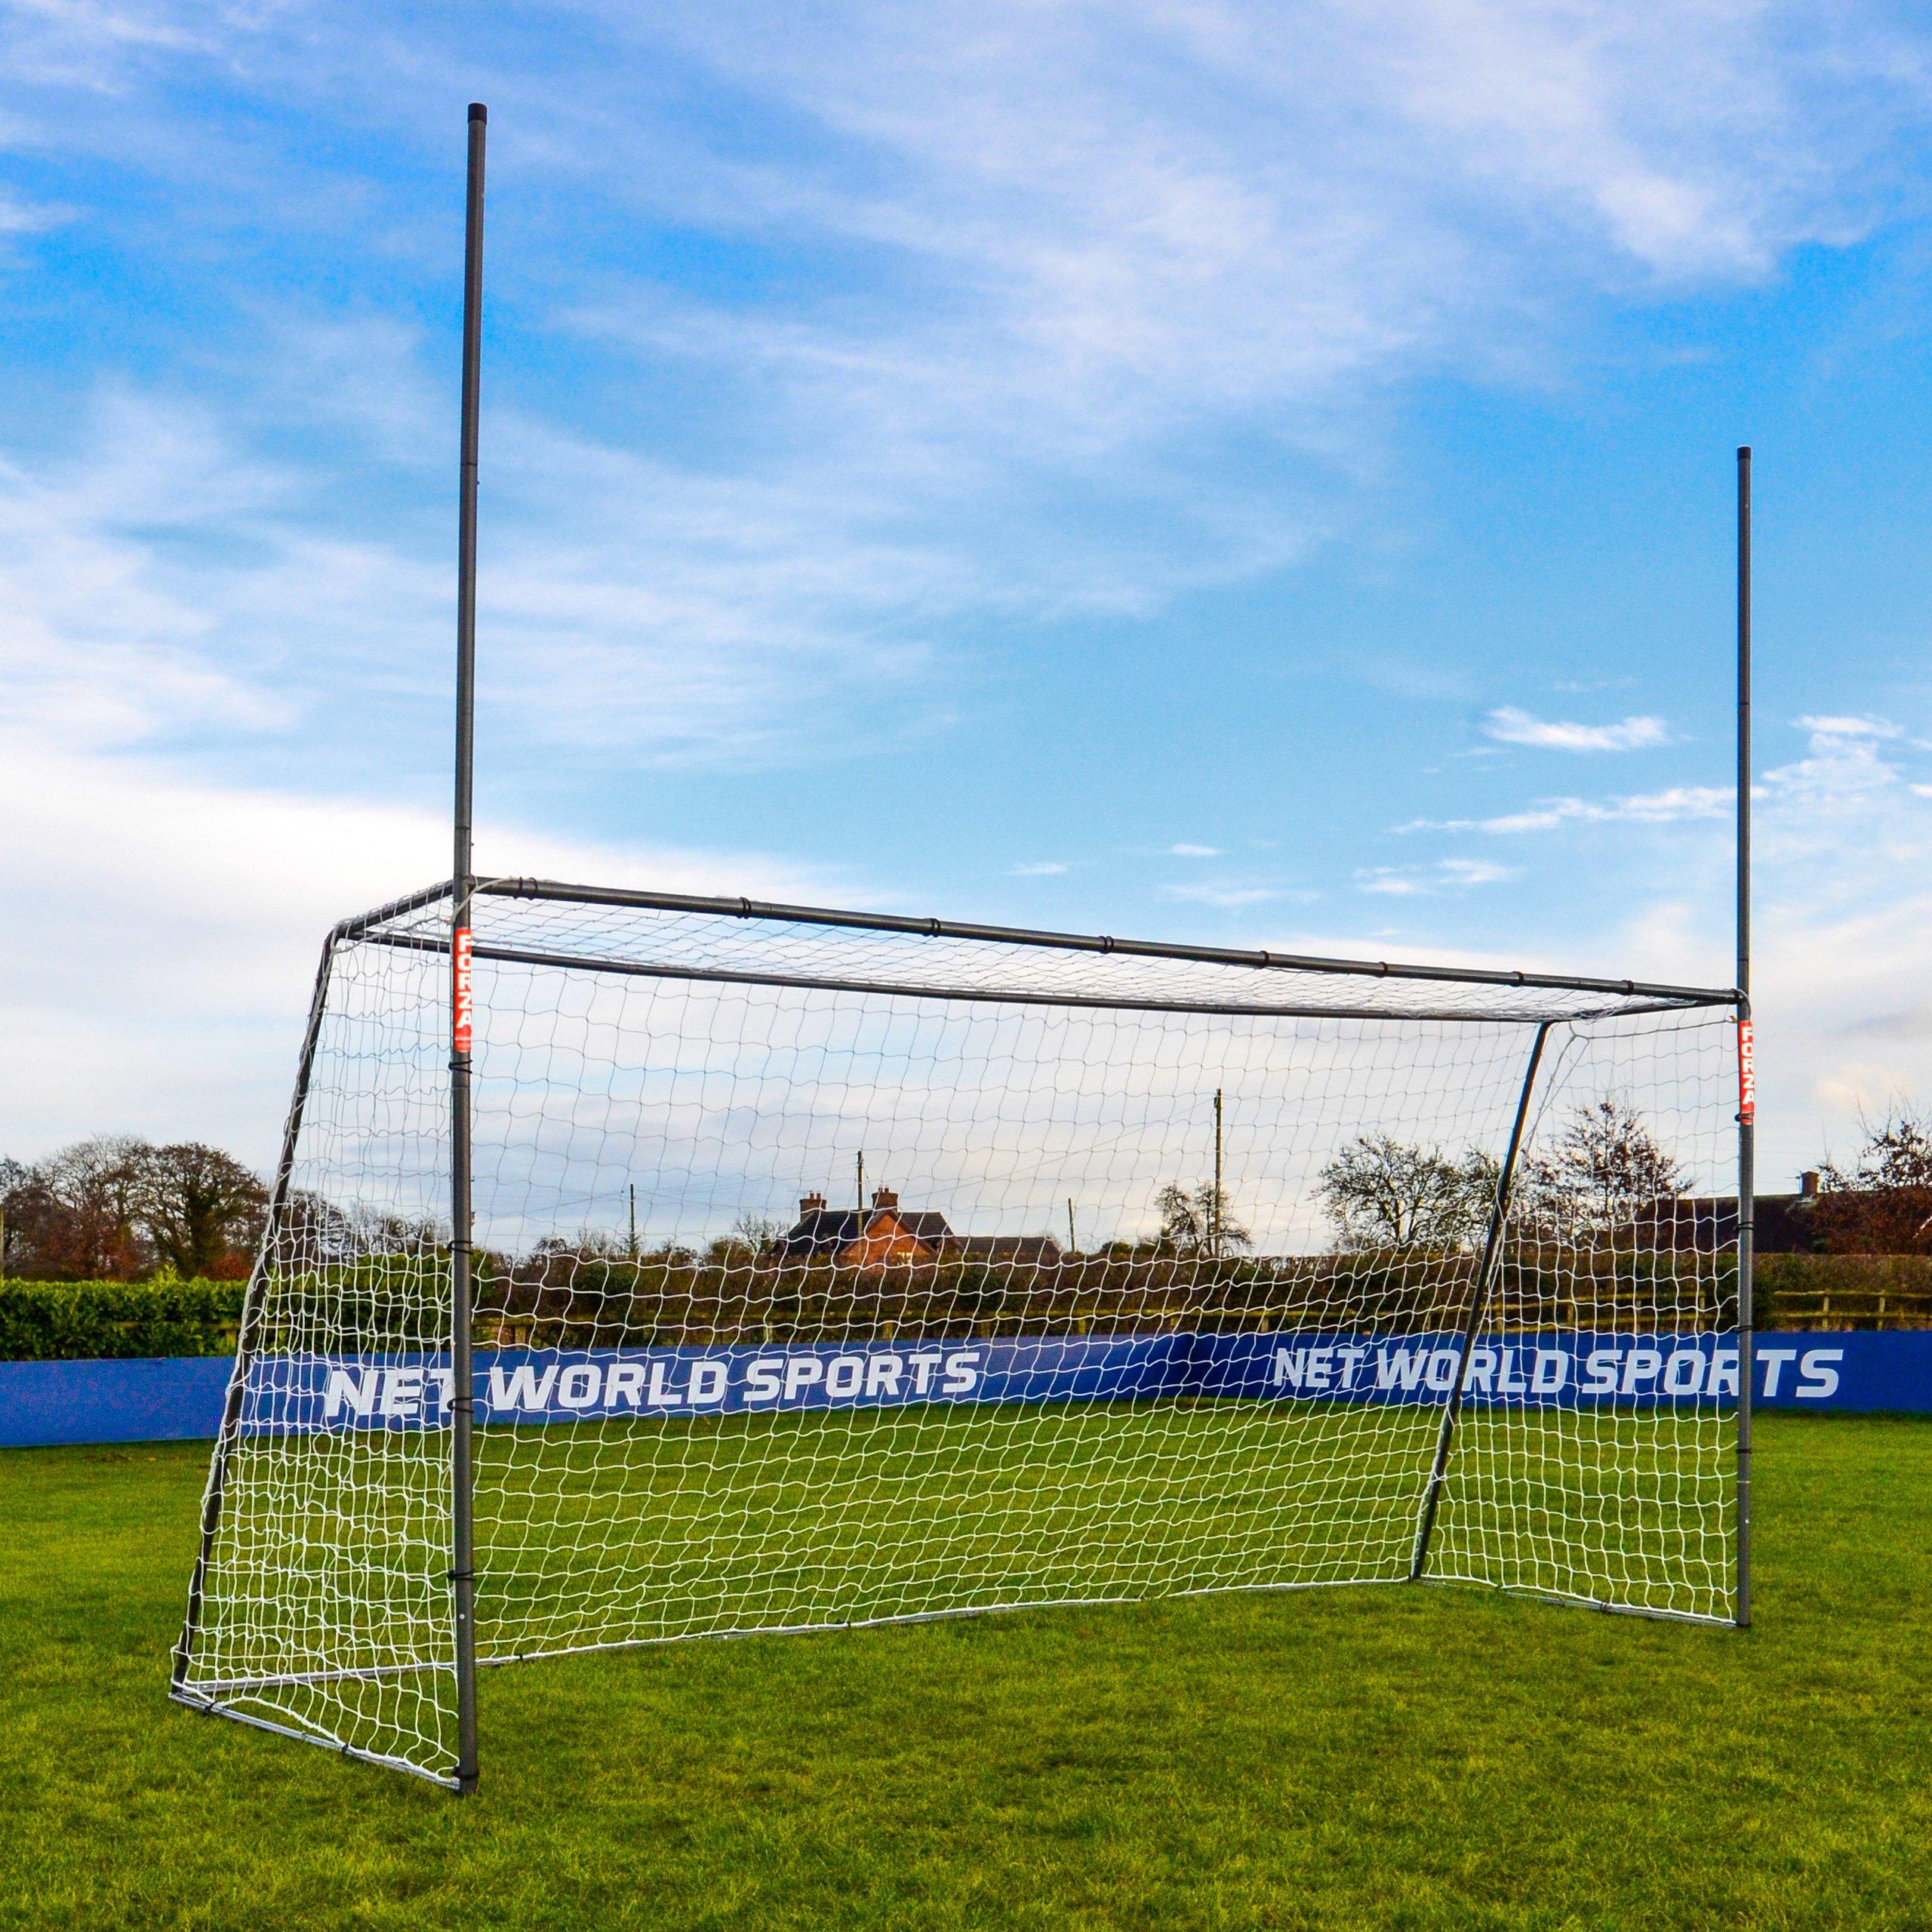 15 x 7 FORZA Steel42 Gaelic & Hurling Goal Posts - The Premium Backyard Goal [Net World Sports] by Net World Sports